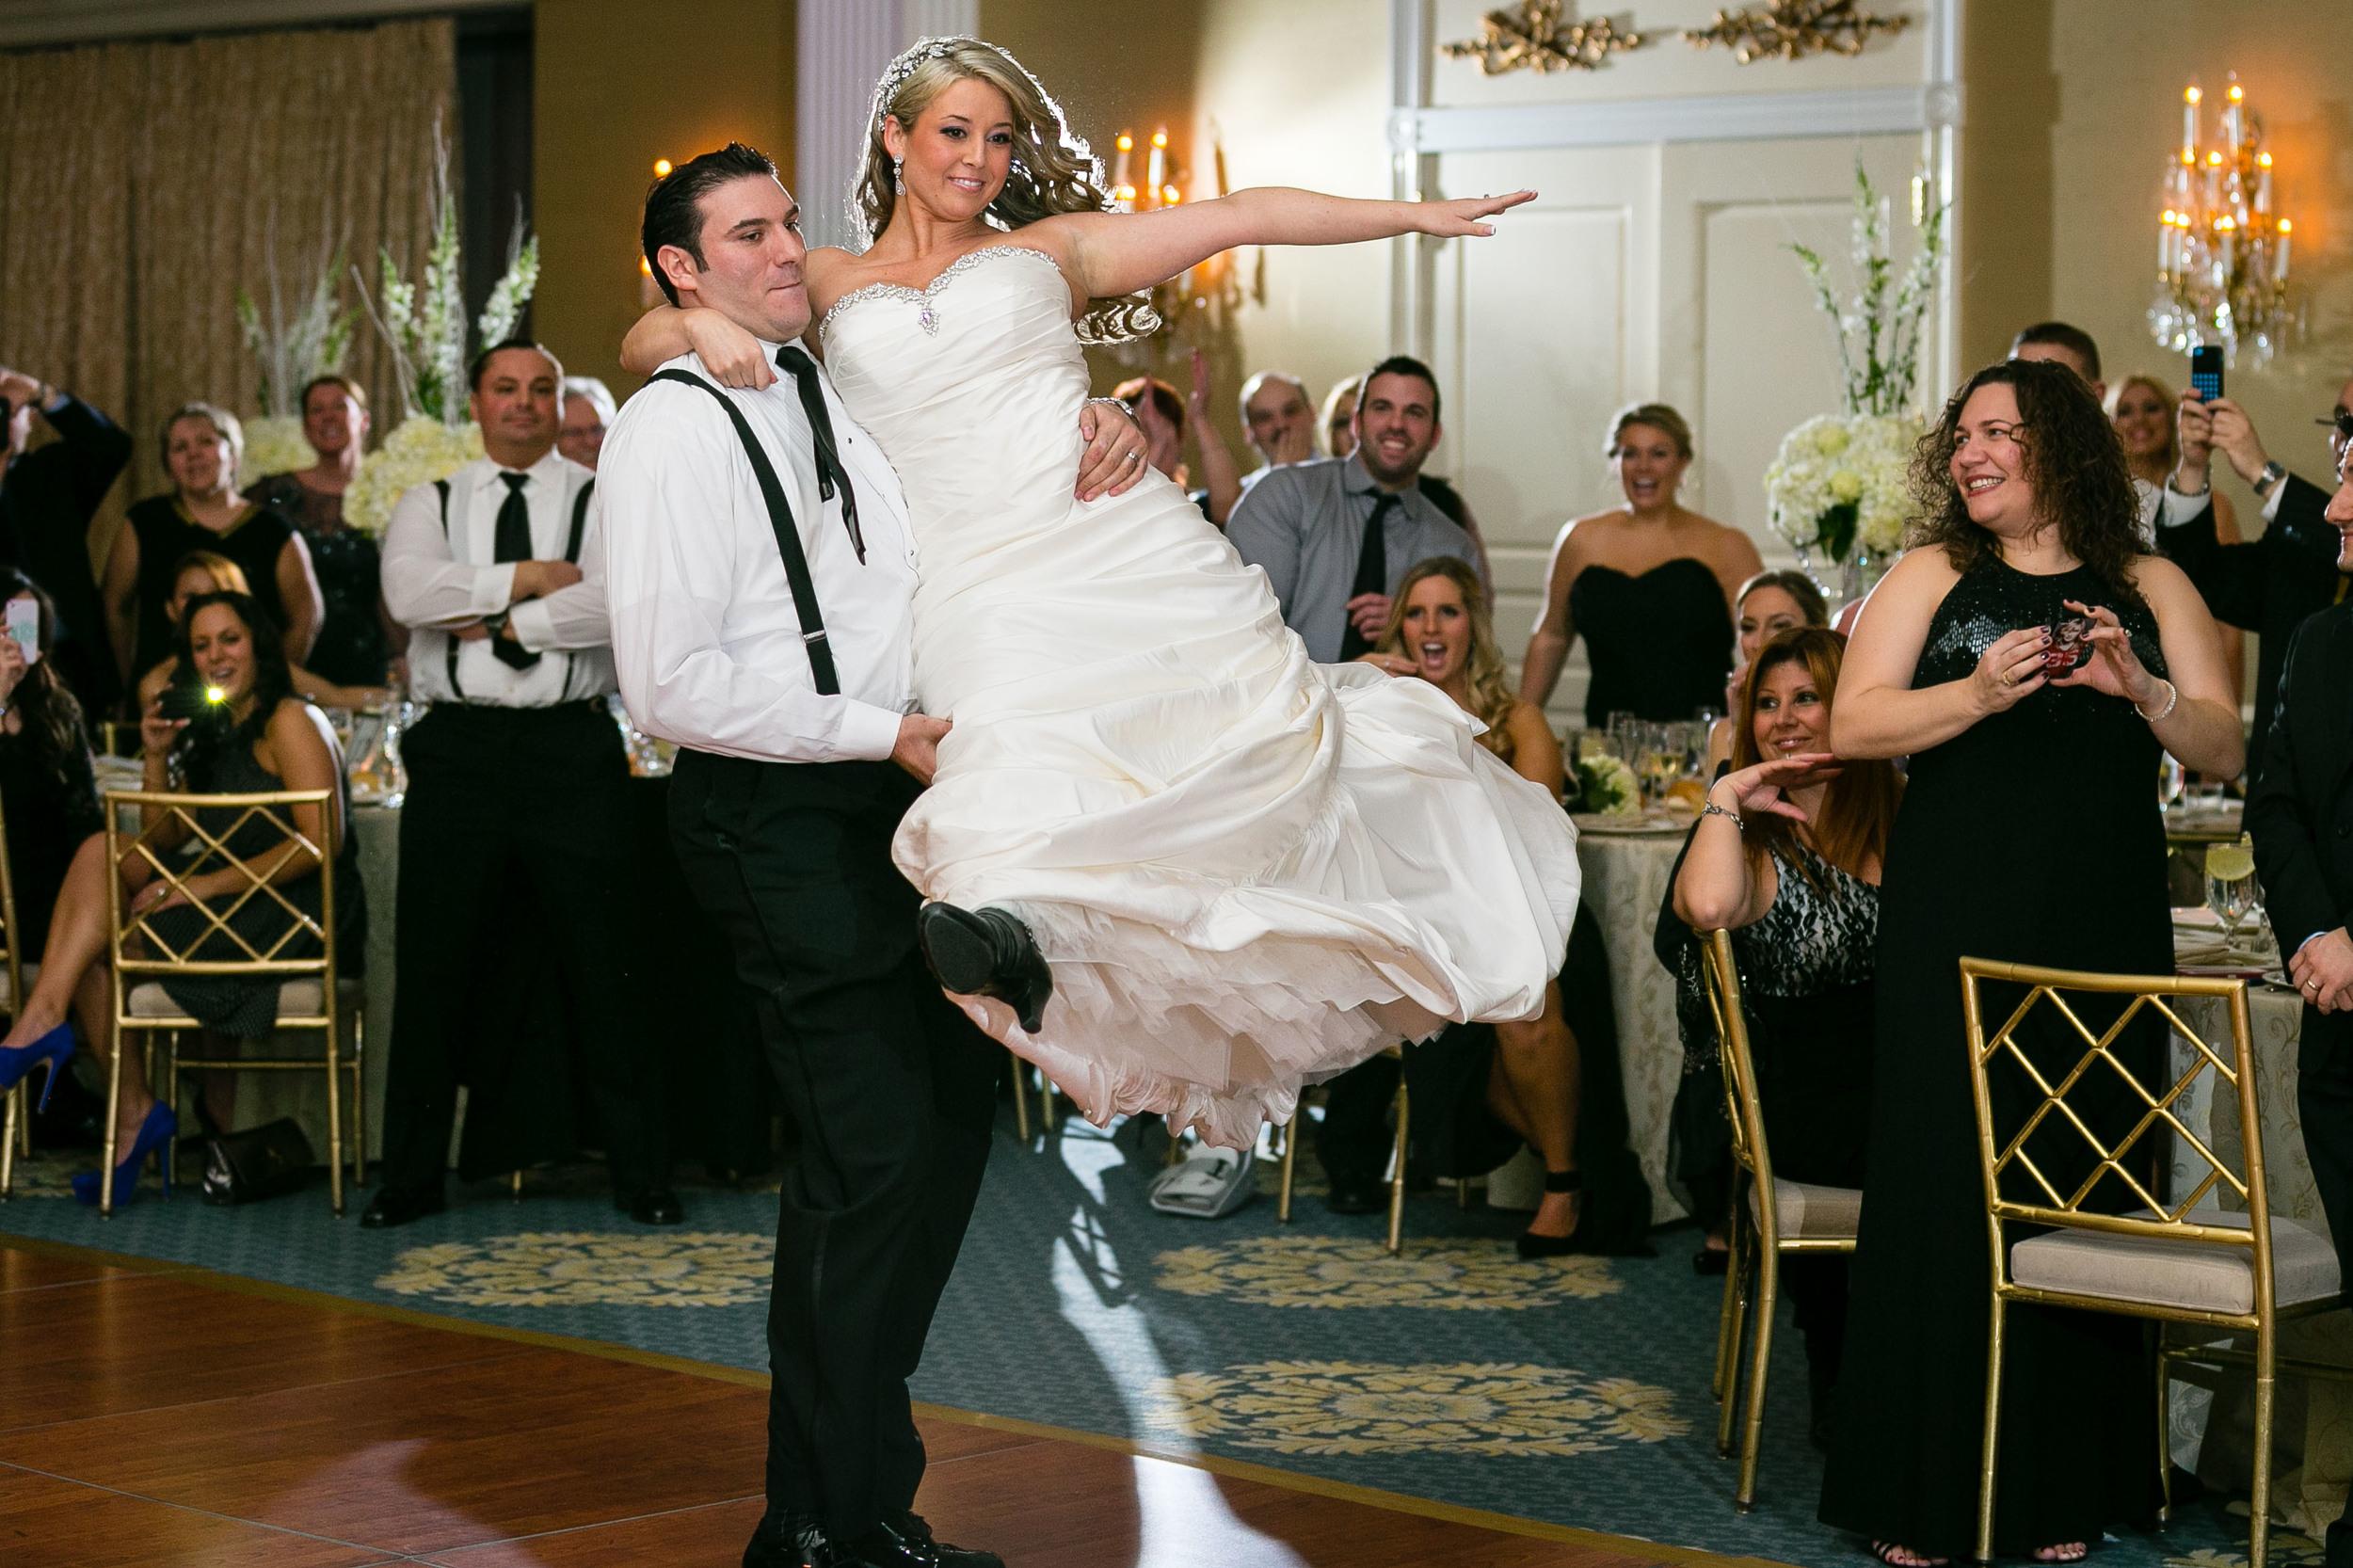 Russian-Jewish-Italian-Luxury-Wedding-The-Palace-at-Somerset-Park-NJ-Documentary-Wedding-Photography-4.jpg